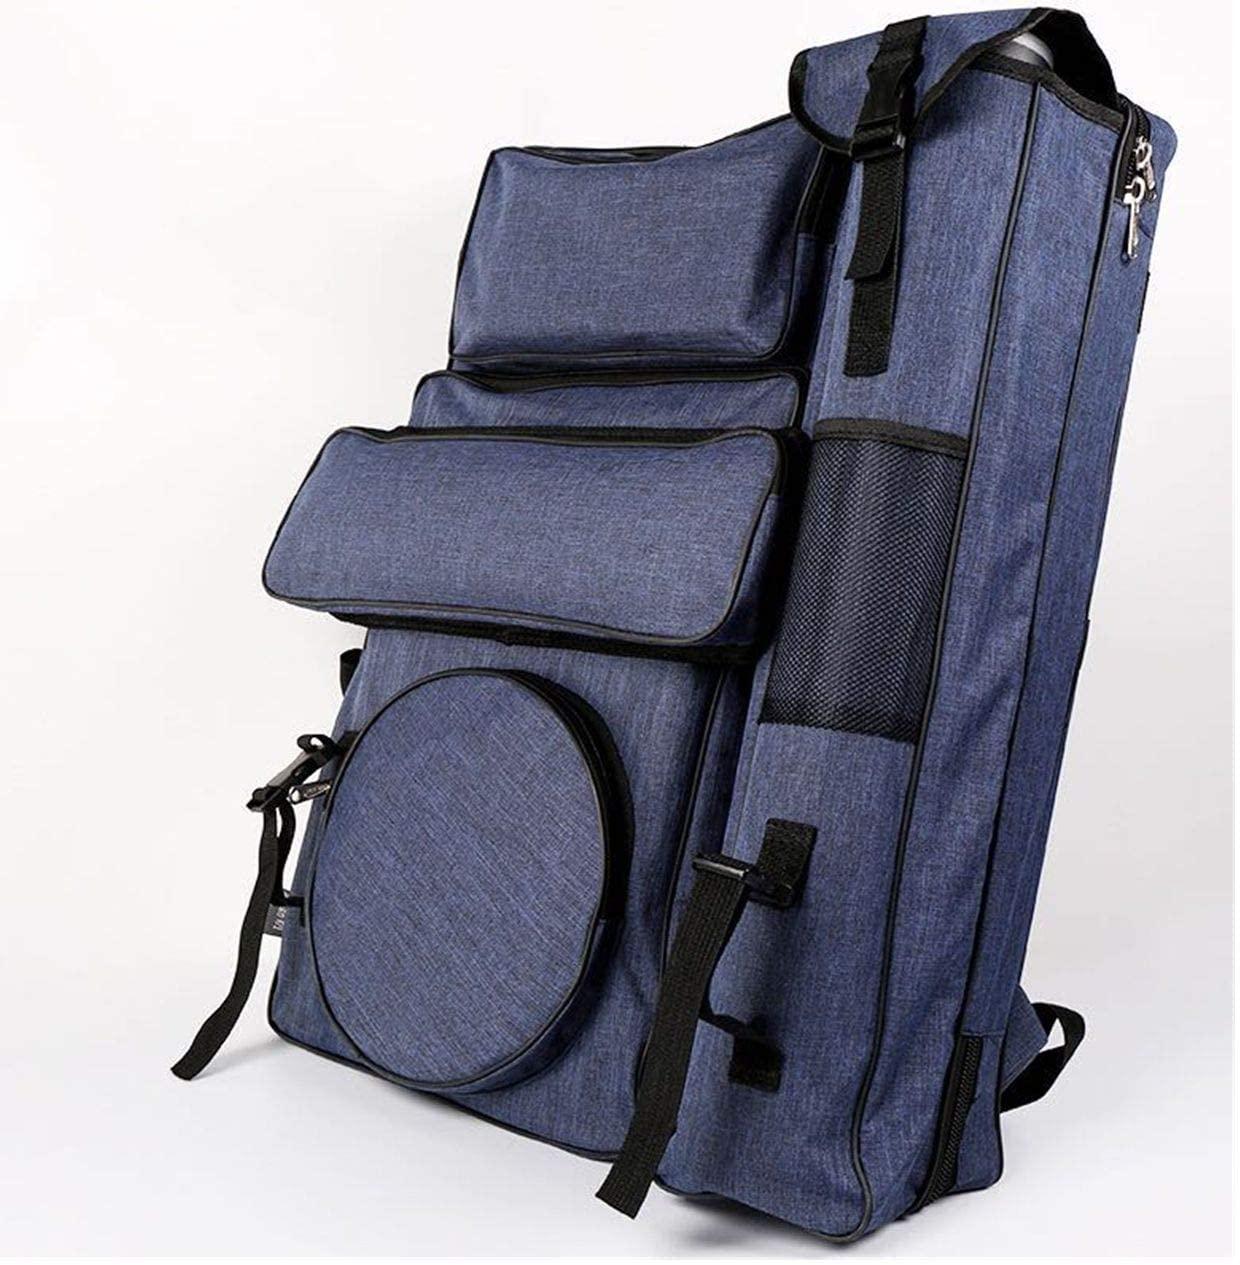 Zaneray Artist Portfolio 4K Canvas Painting Backpack Waterproof Art Storage Bag for Outdoor Class Blue